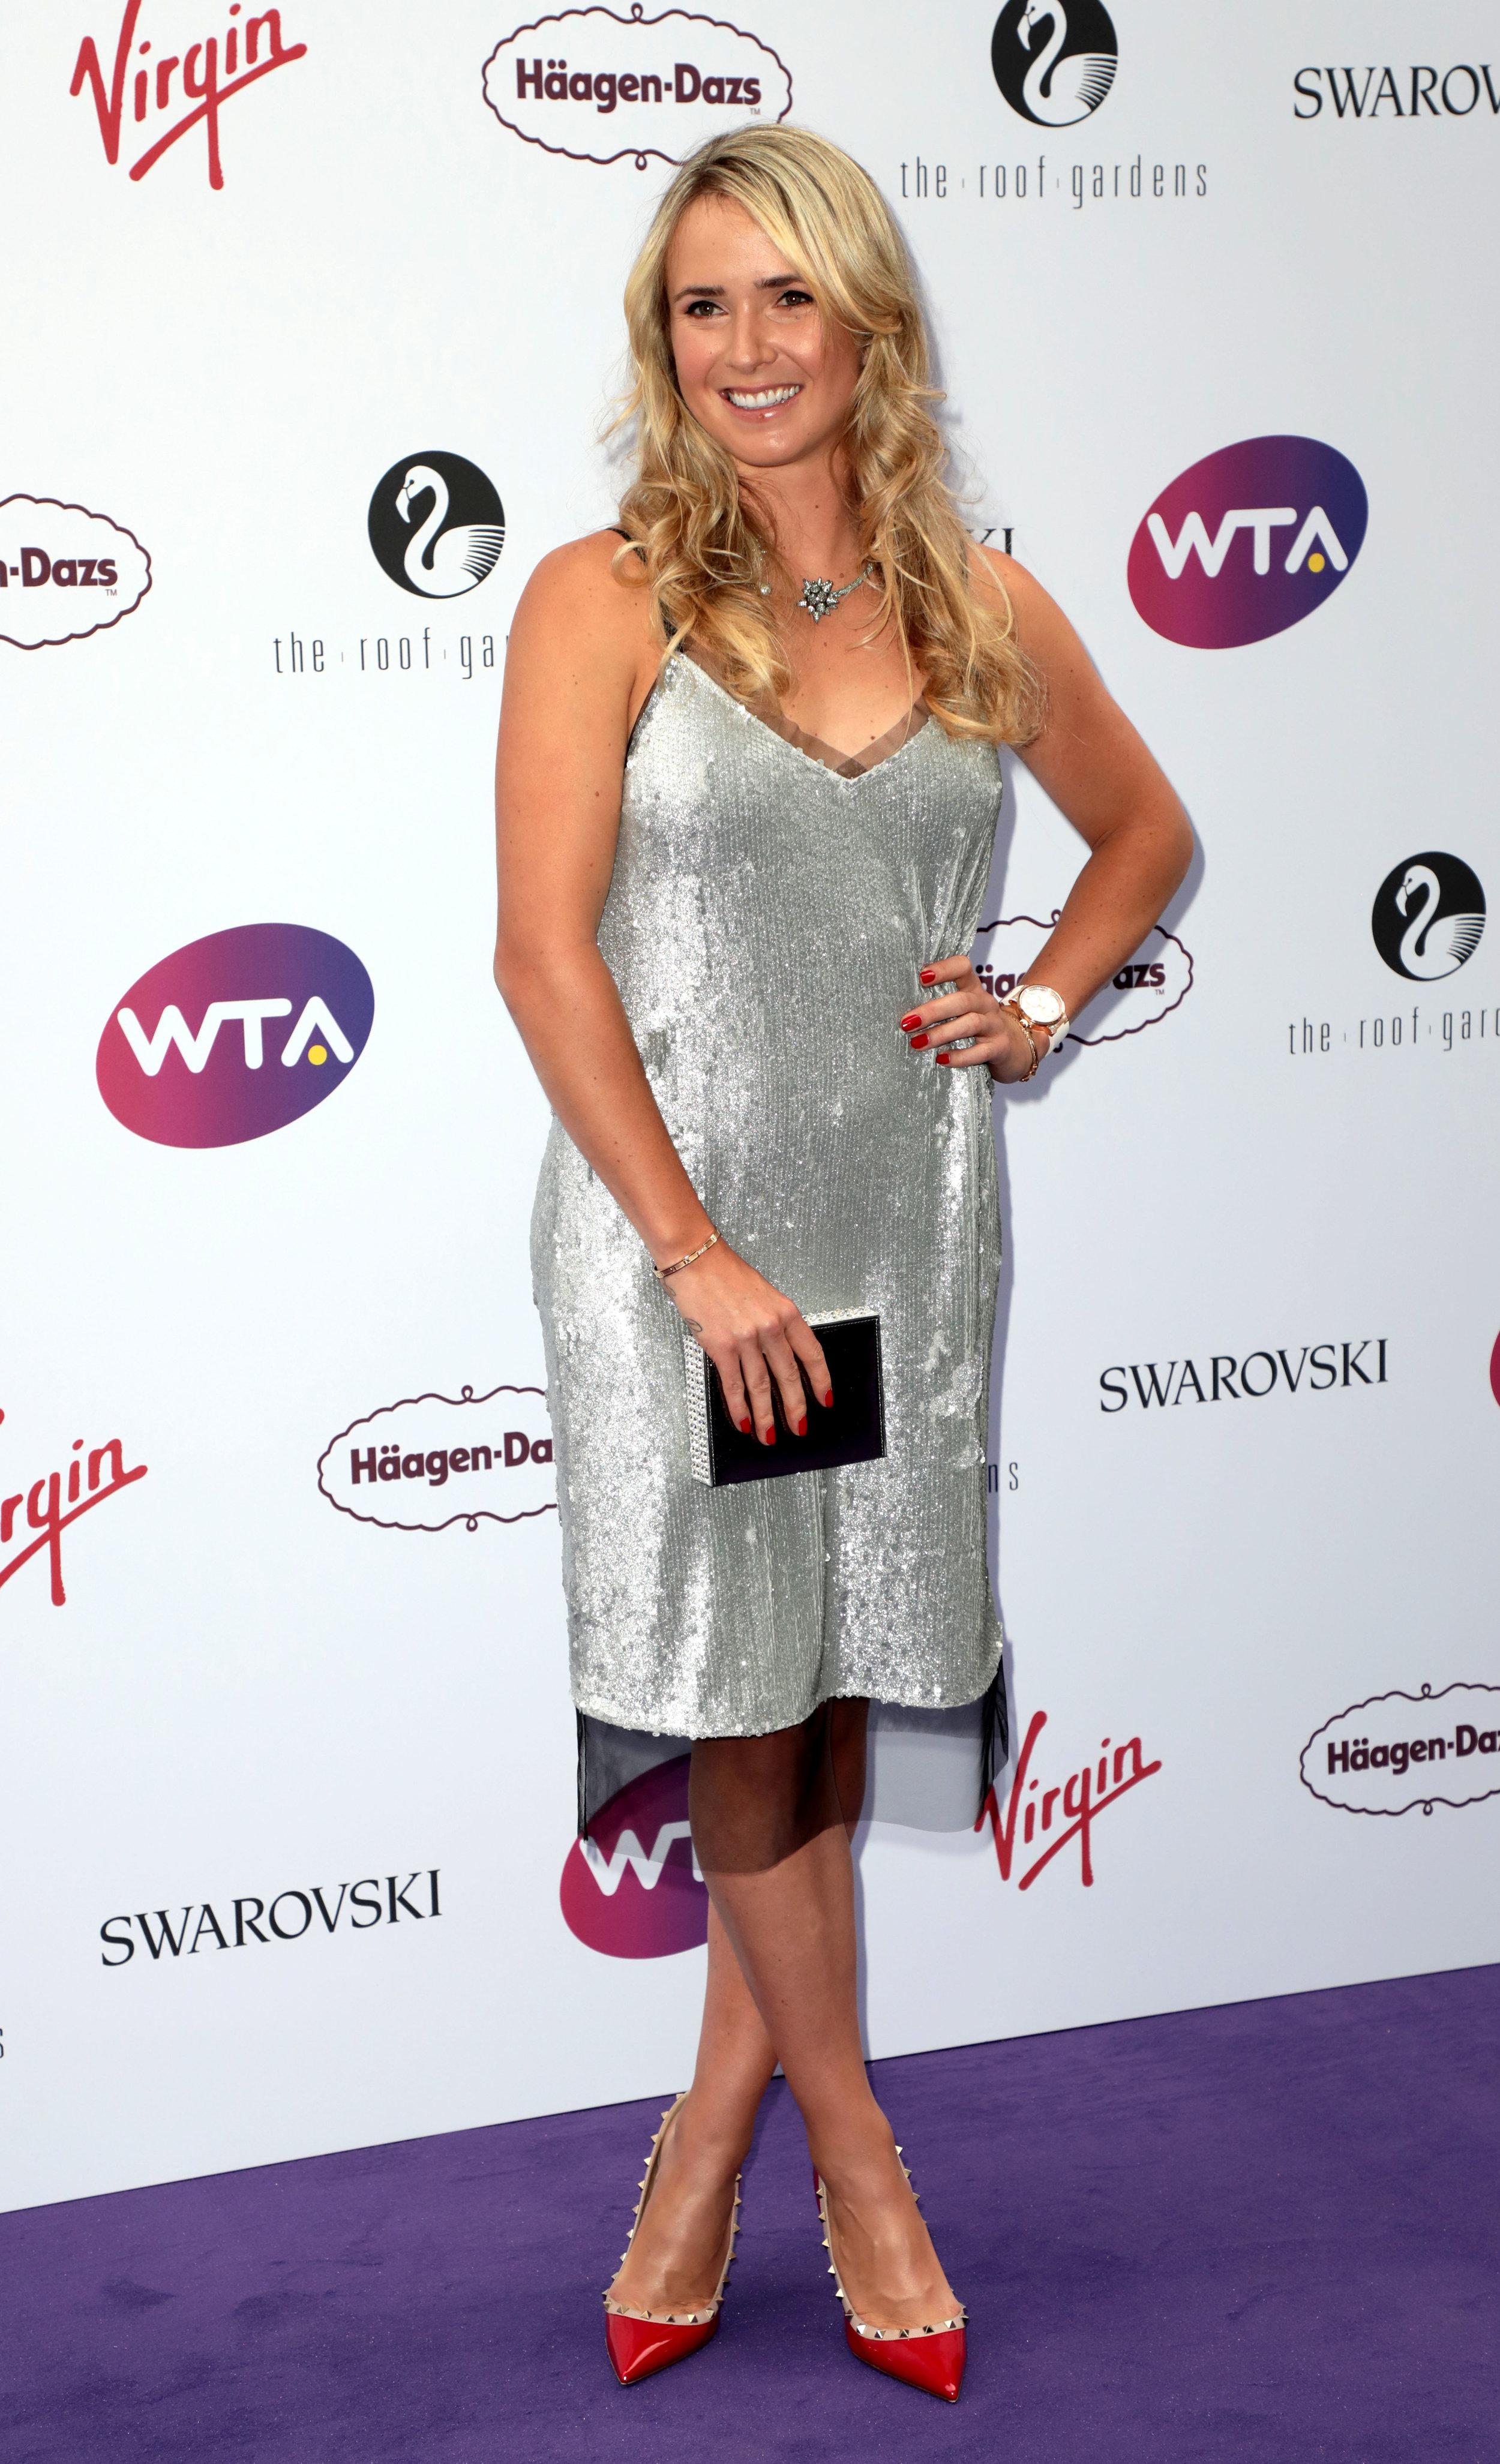 PHT_B5327_WTA_Pre_Wimbledon_Party_13806.JPG